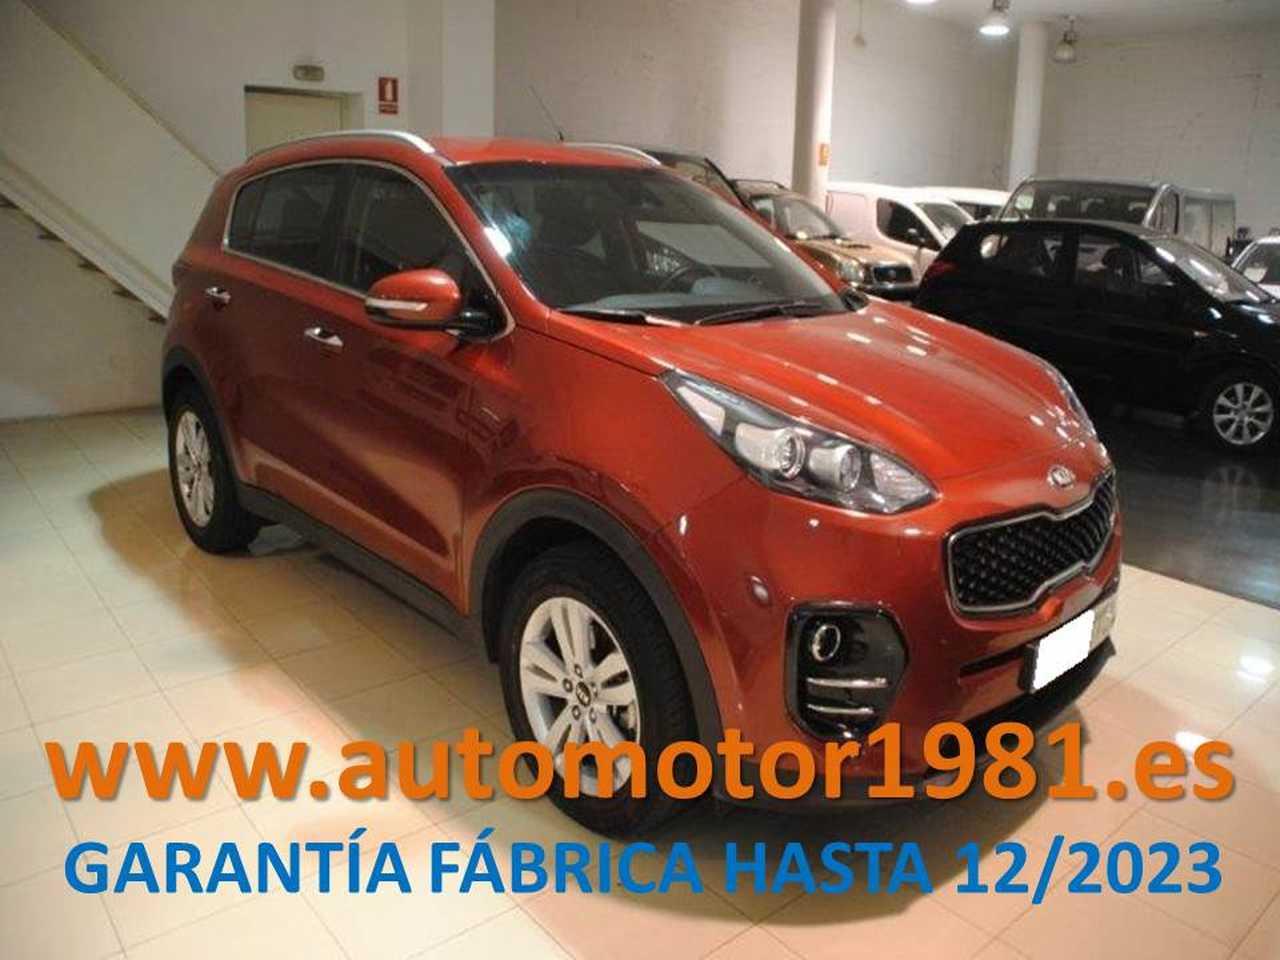 Kia Sportage 1.7CRDi VGT Eco-Dynamics Drive 4x2 - GARANTIA FABRICA 12/2023  - Foto 1